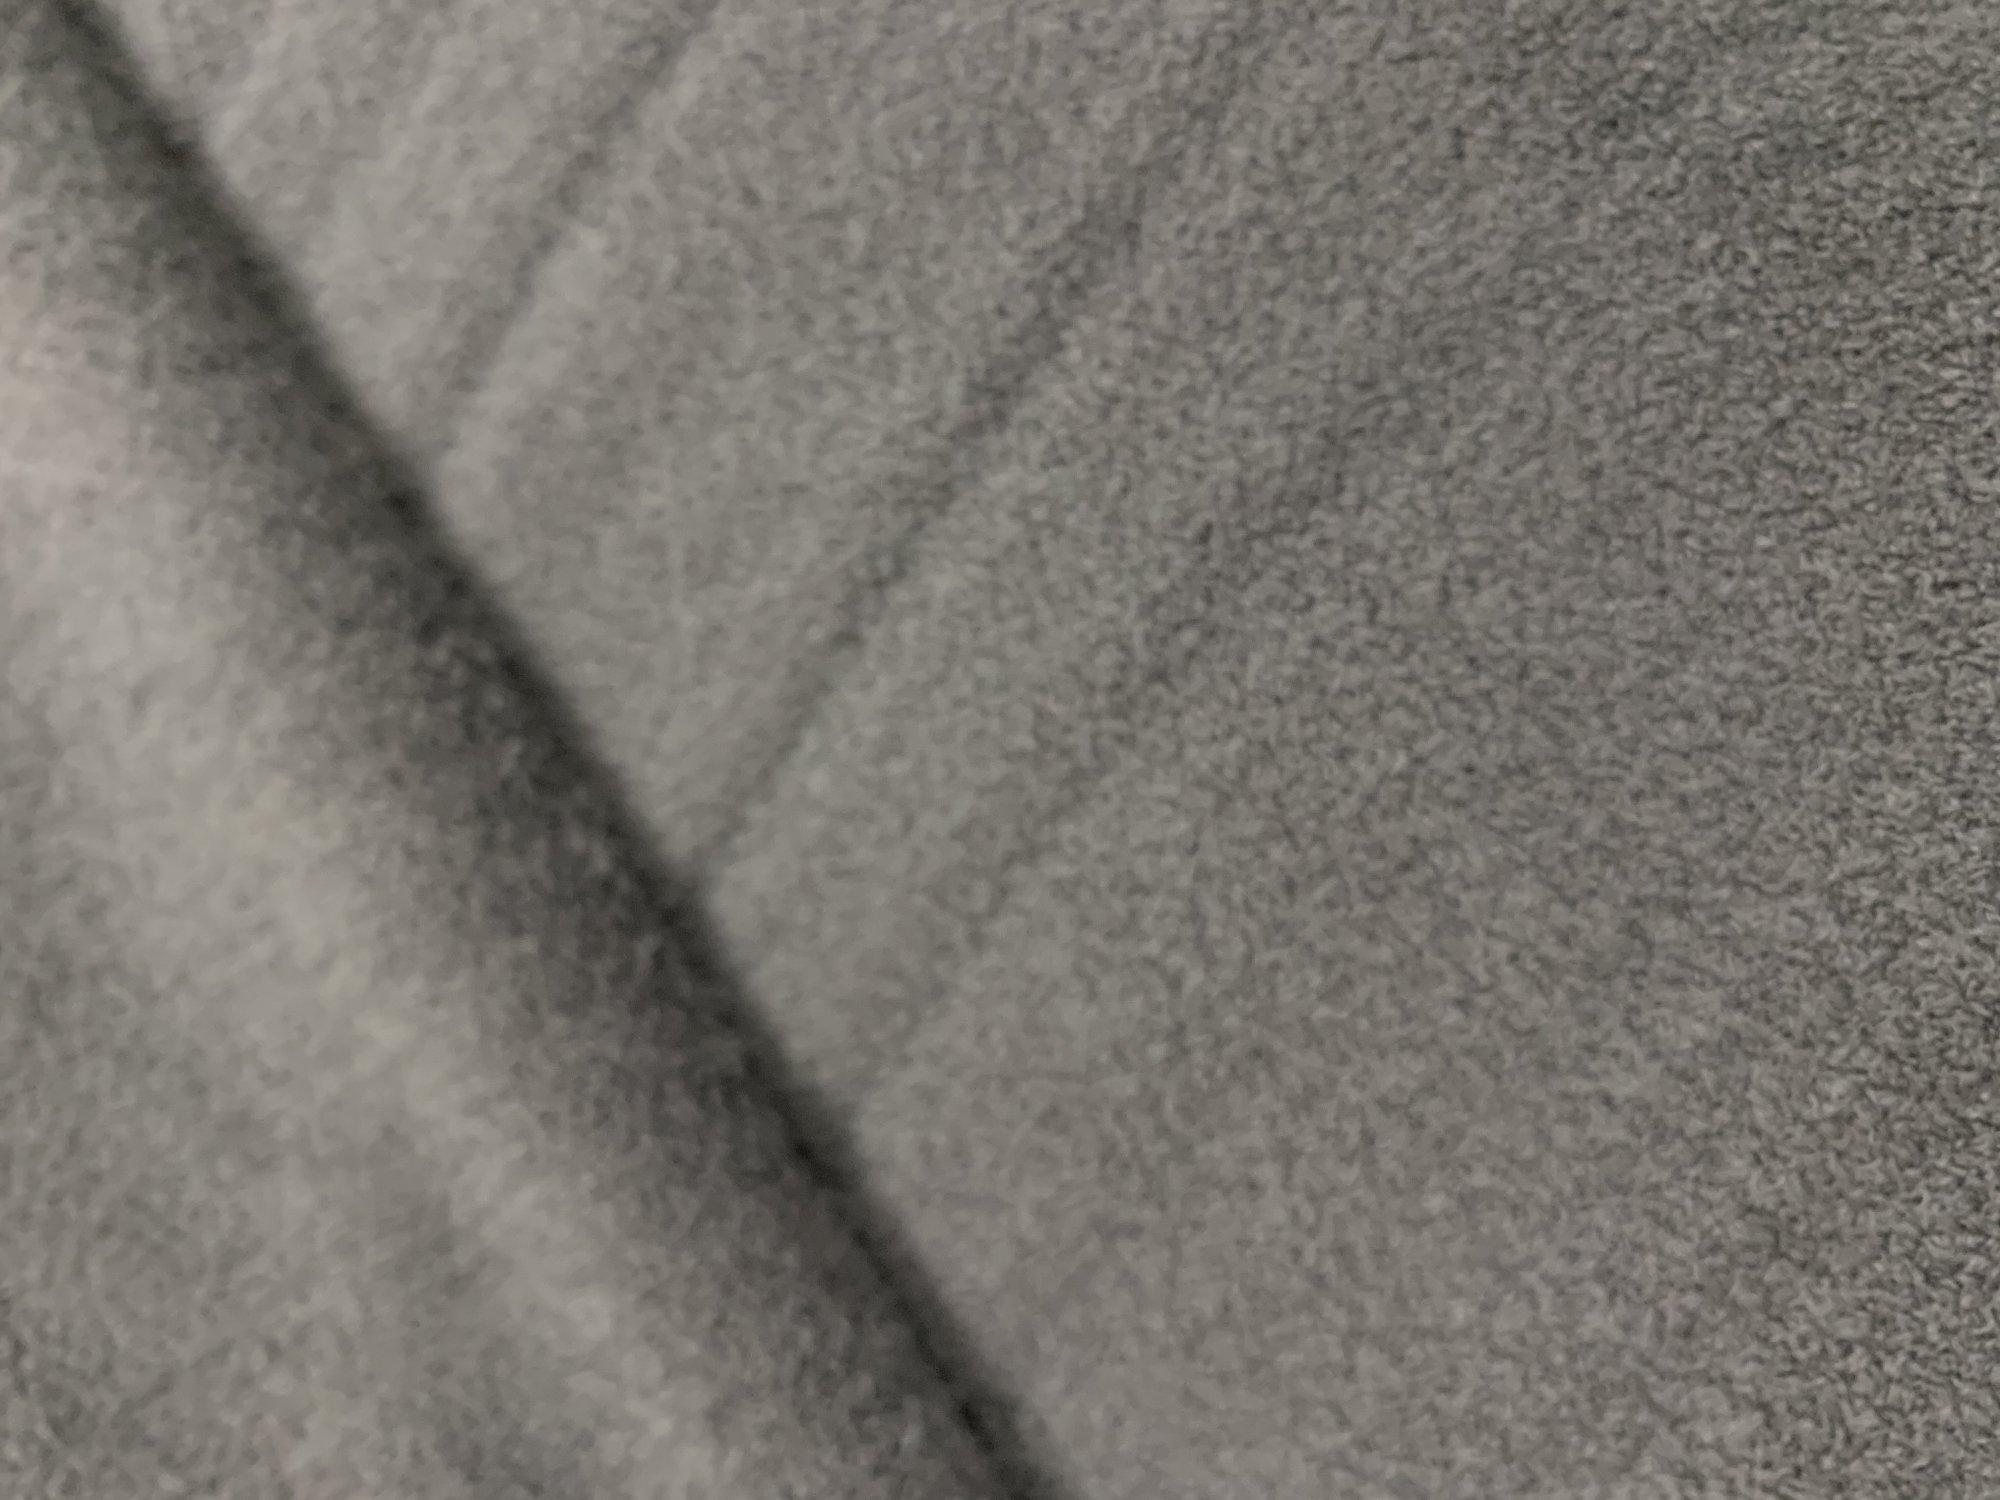 Moda 60 Soft Textures Fireside Dark Grey 60001 23